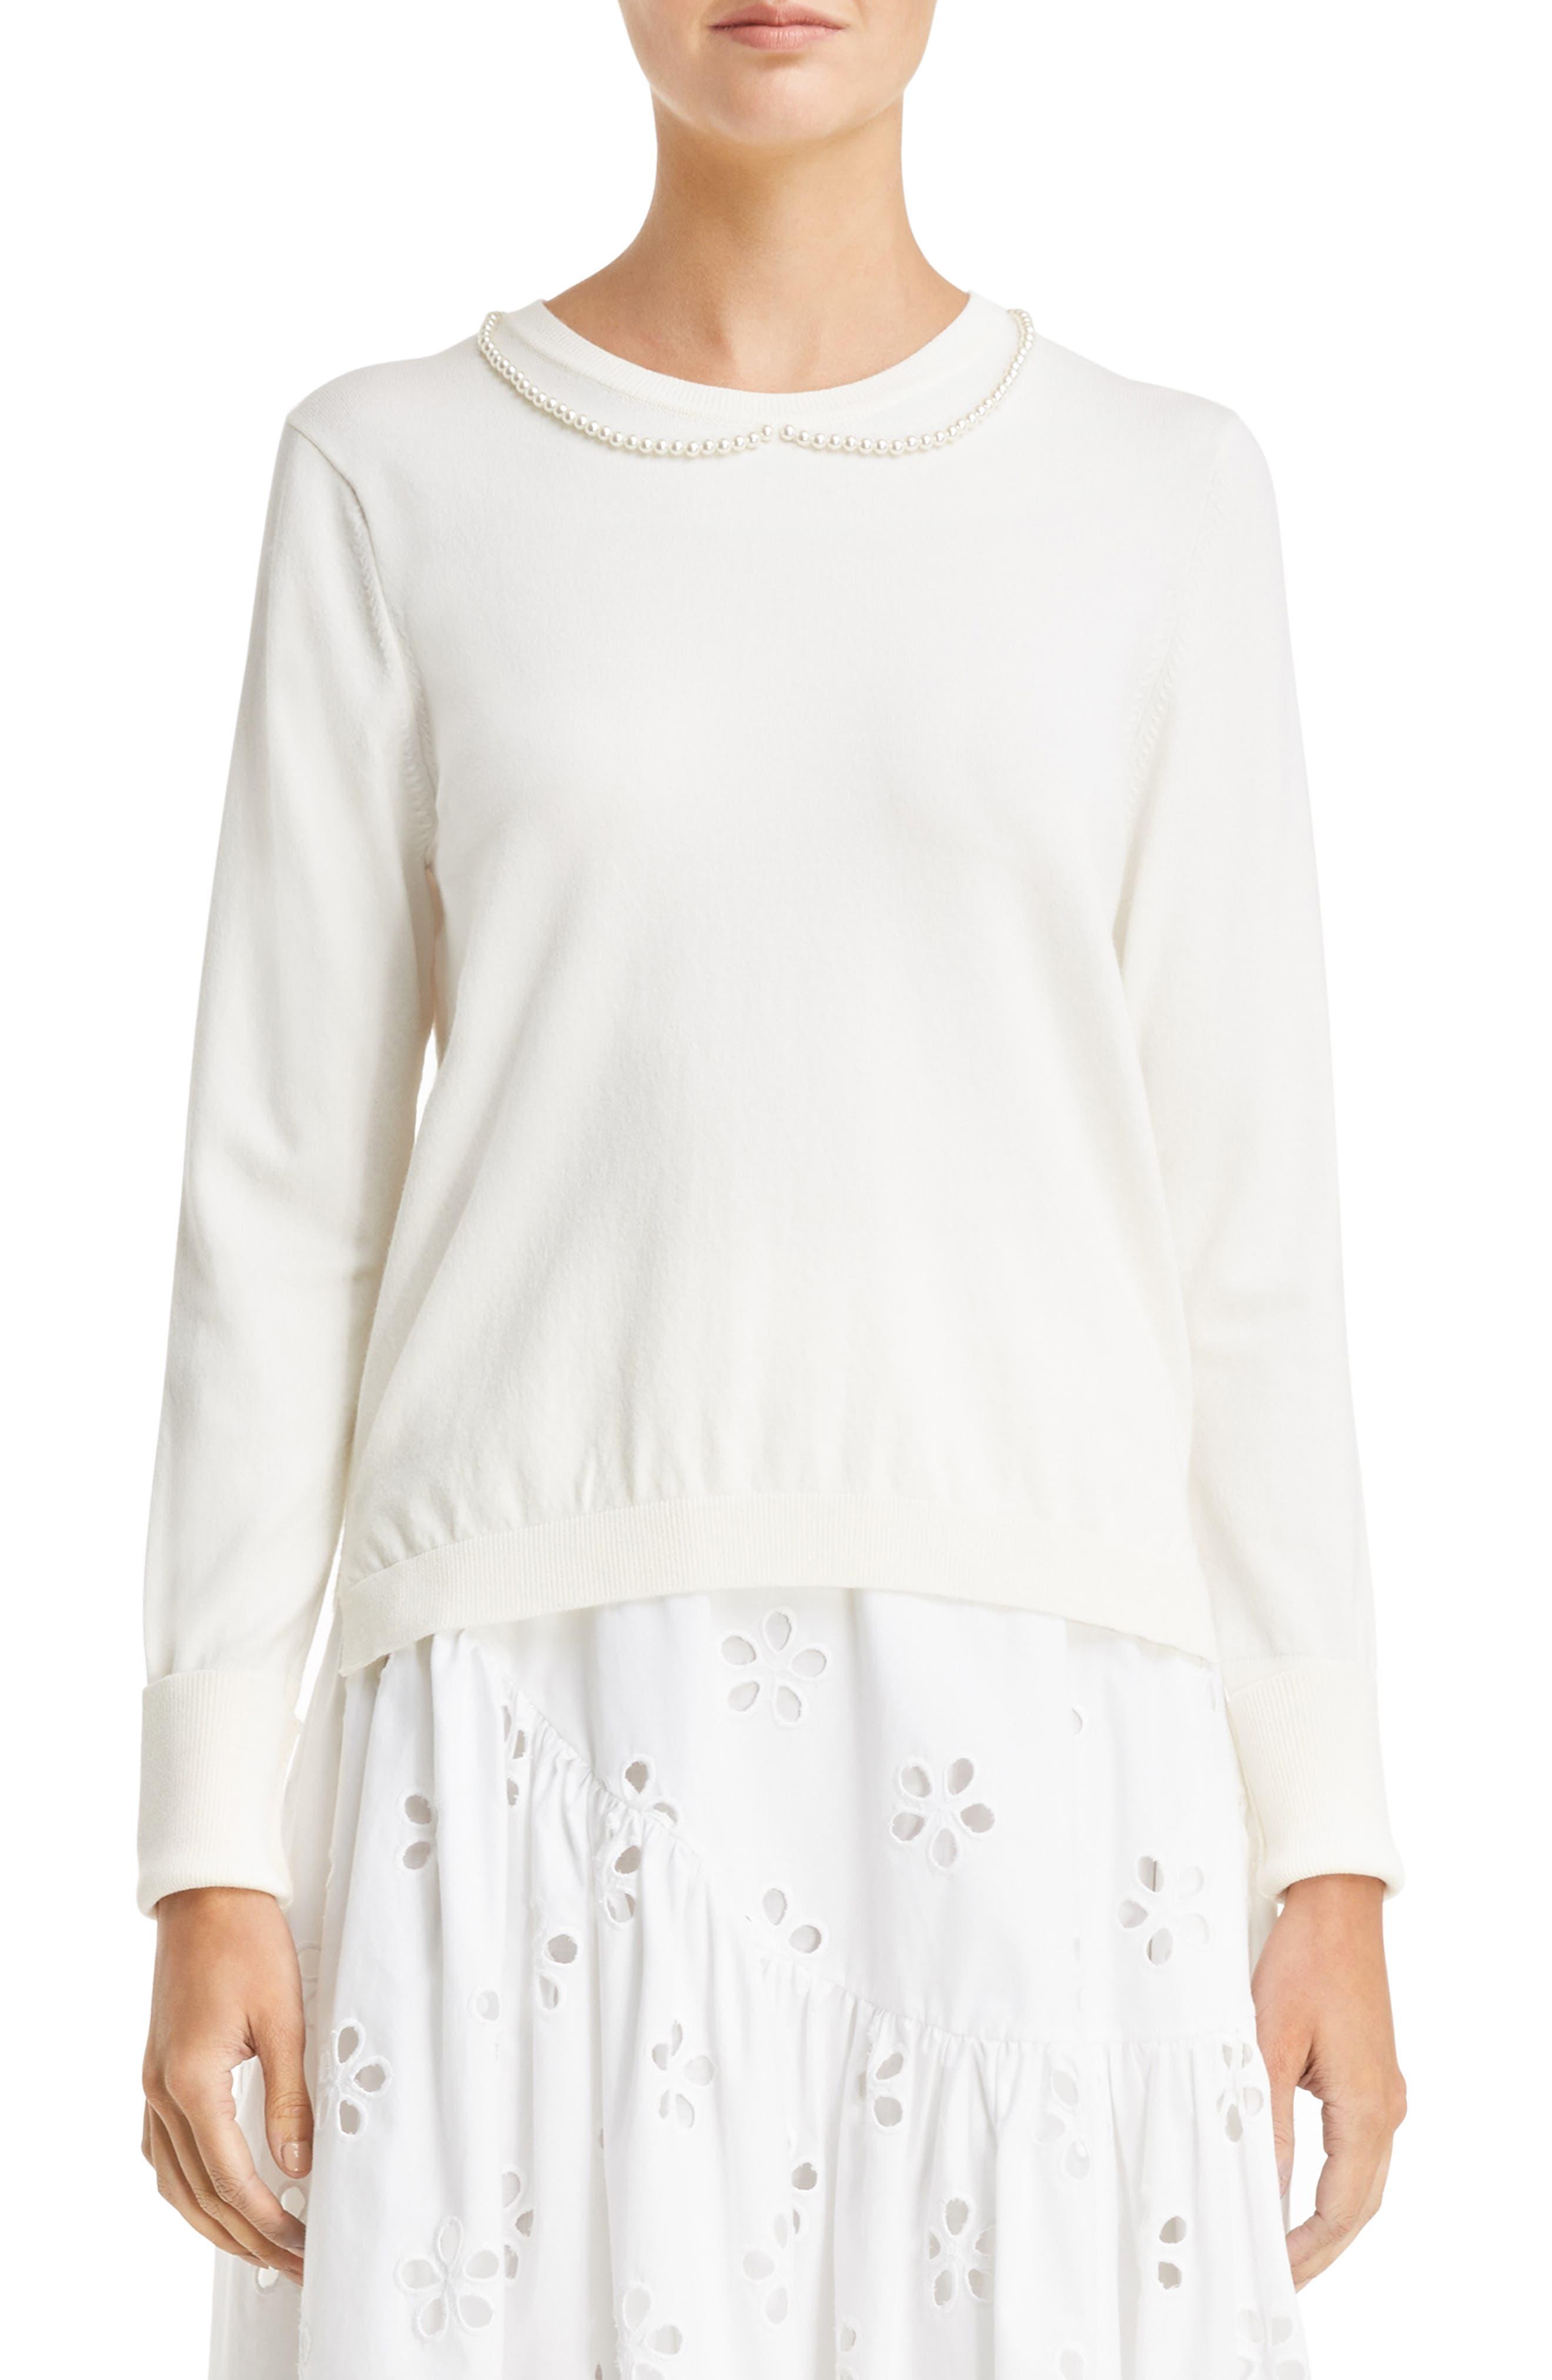 Main Image - Simone Rocha Imitation Pearl Embellished Sweater